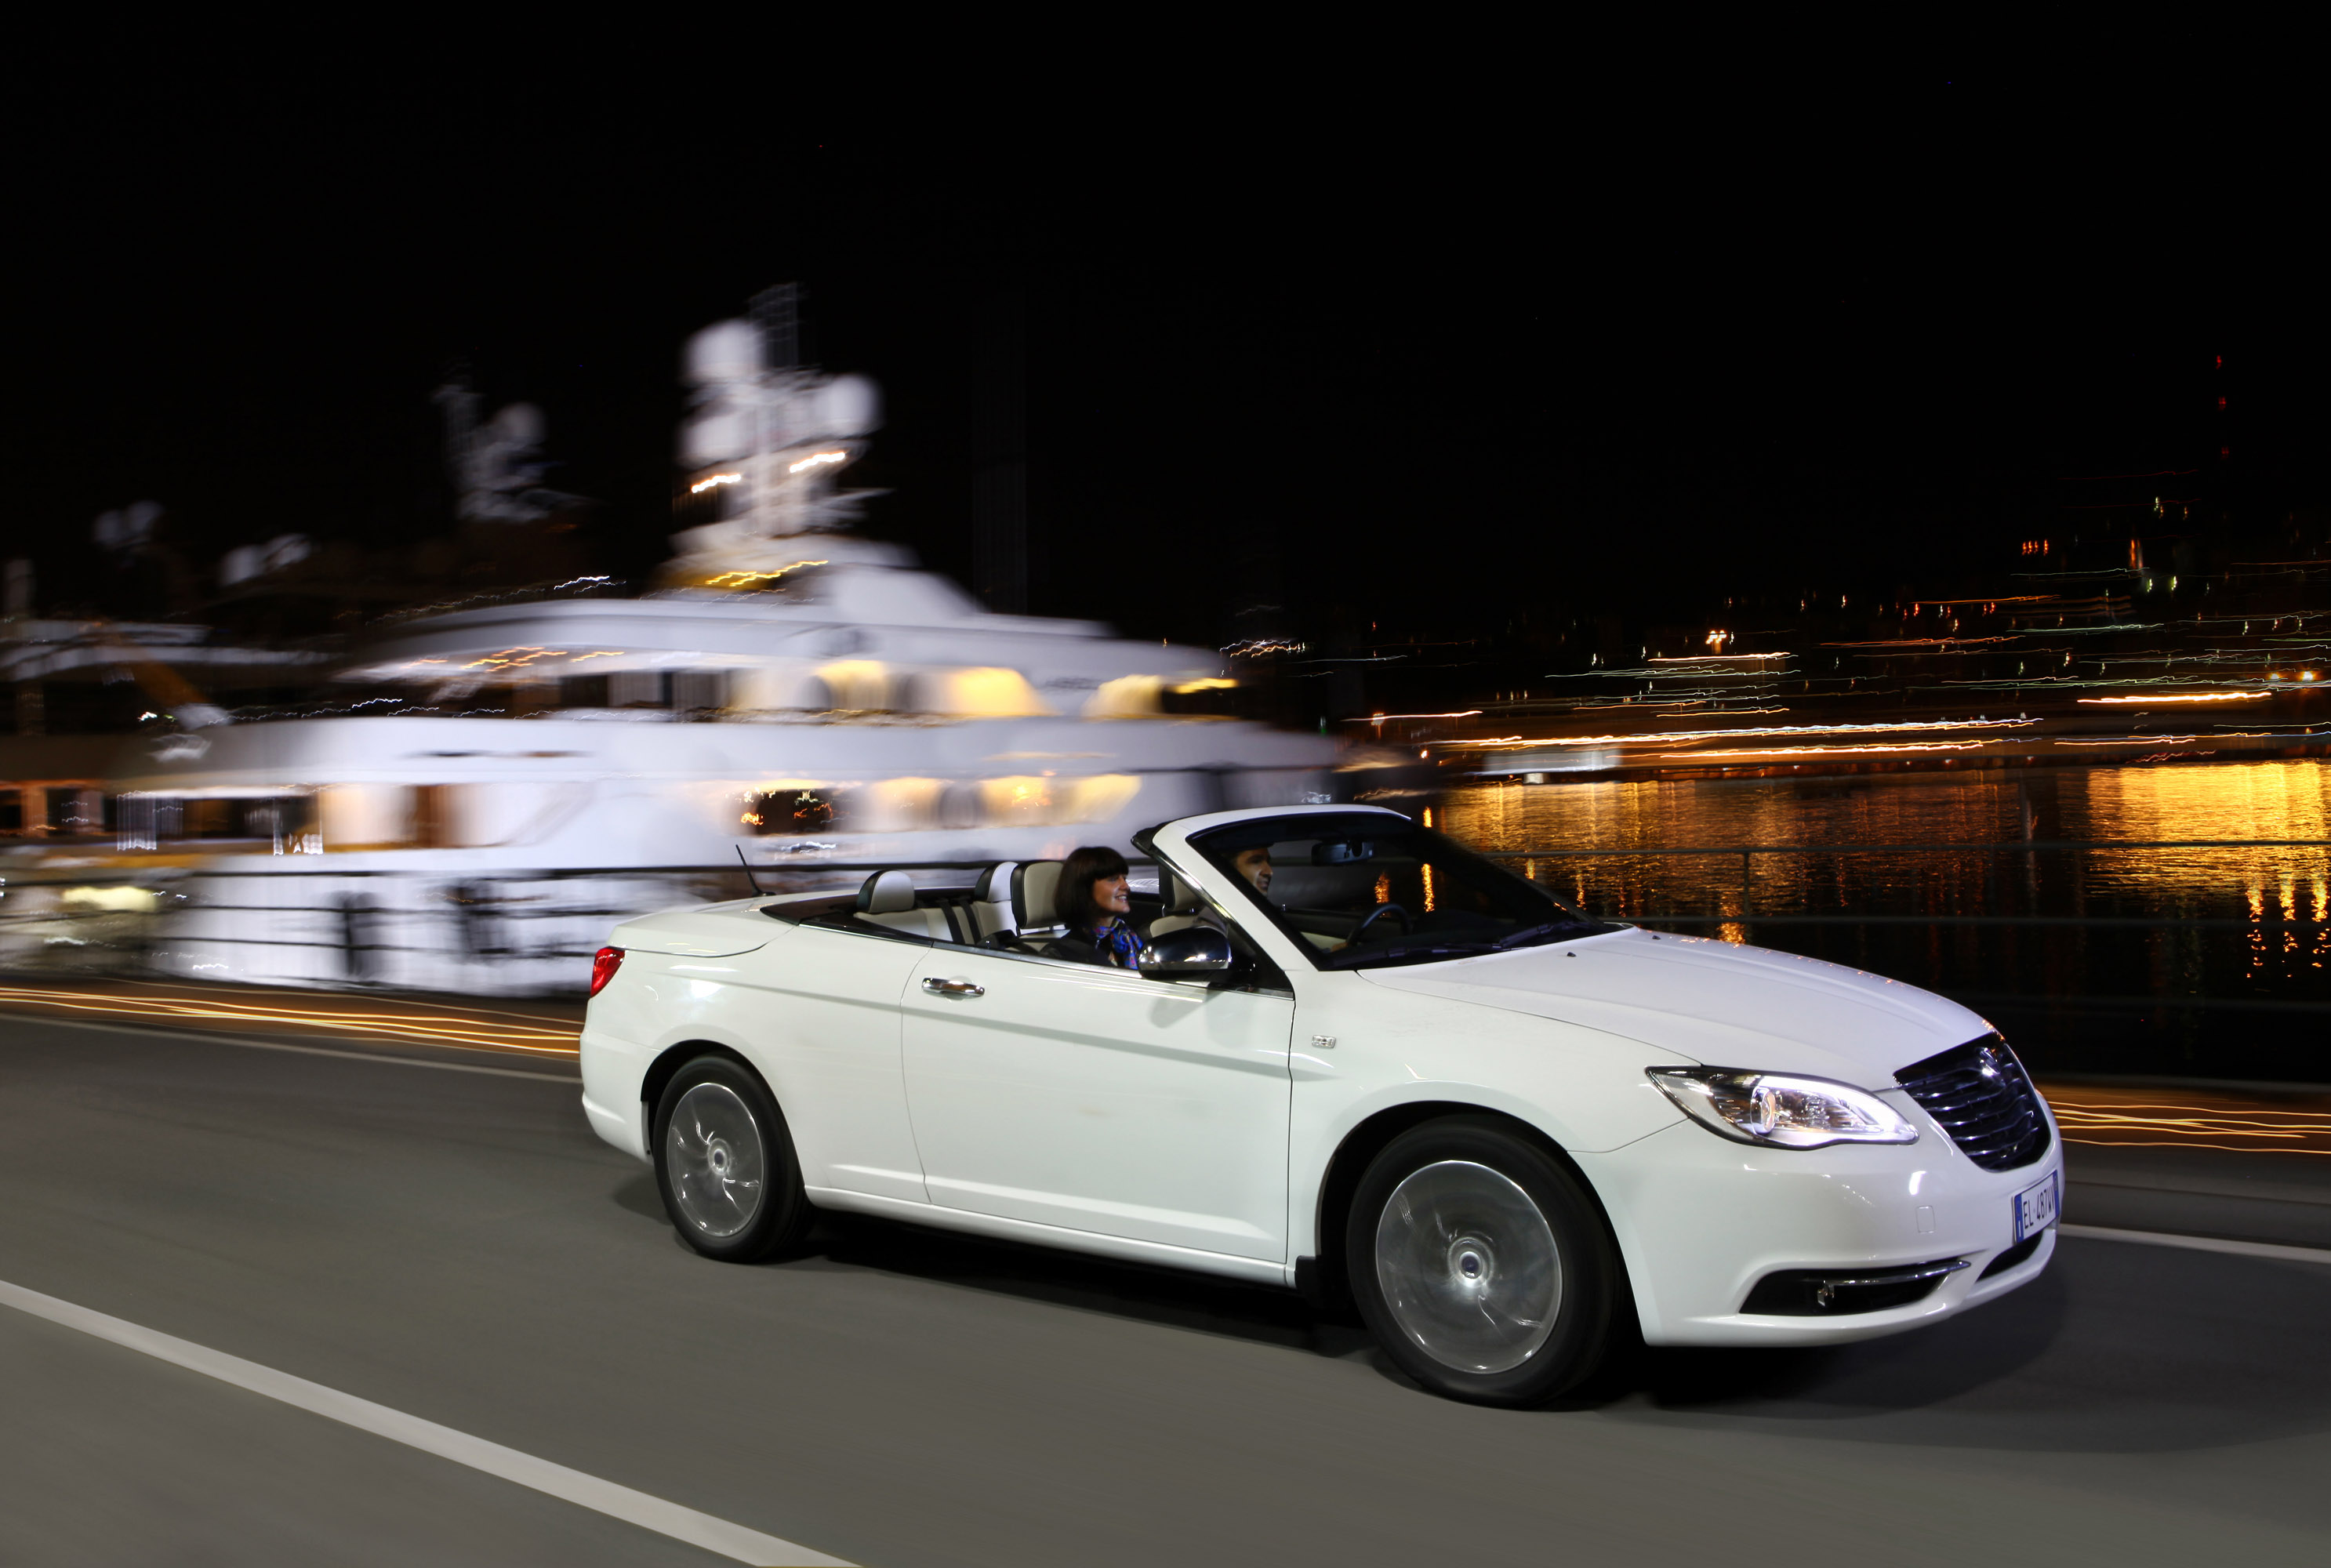 http://partsopen.com/images/2013-lancia-flavia-convertible-1.jpg